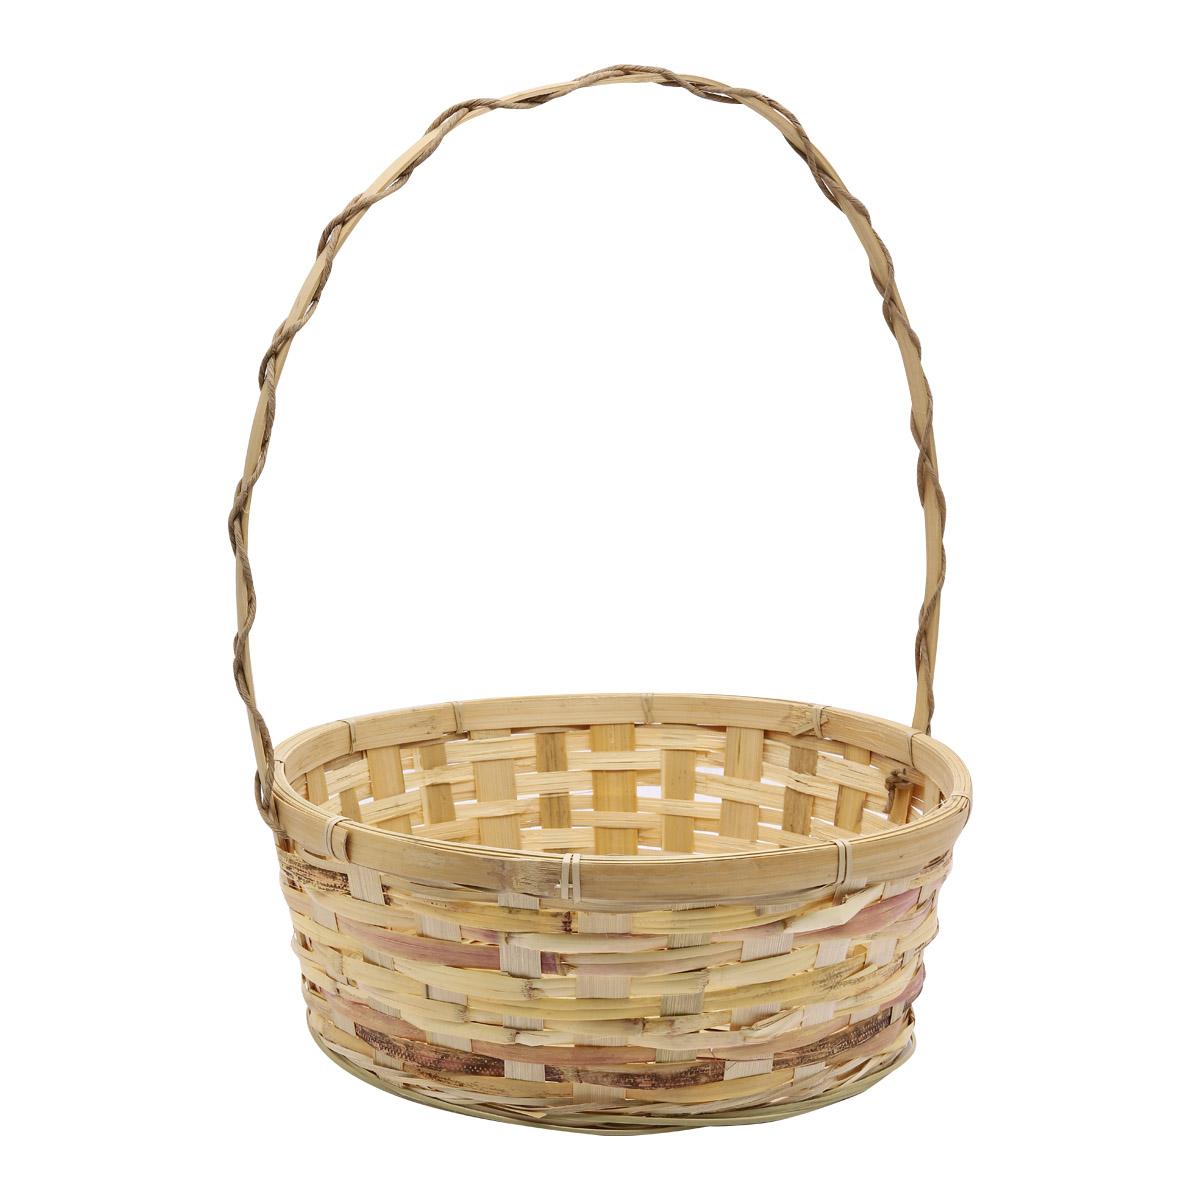 19HJ19085 Корзина плетеная бамбук 32*12*Н38см, цв. натуральный Астра